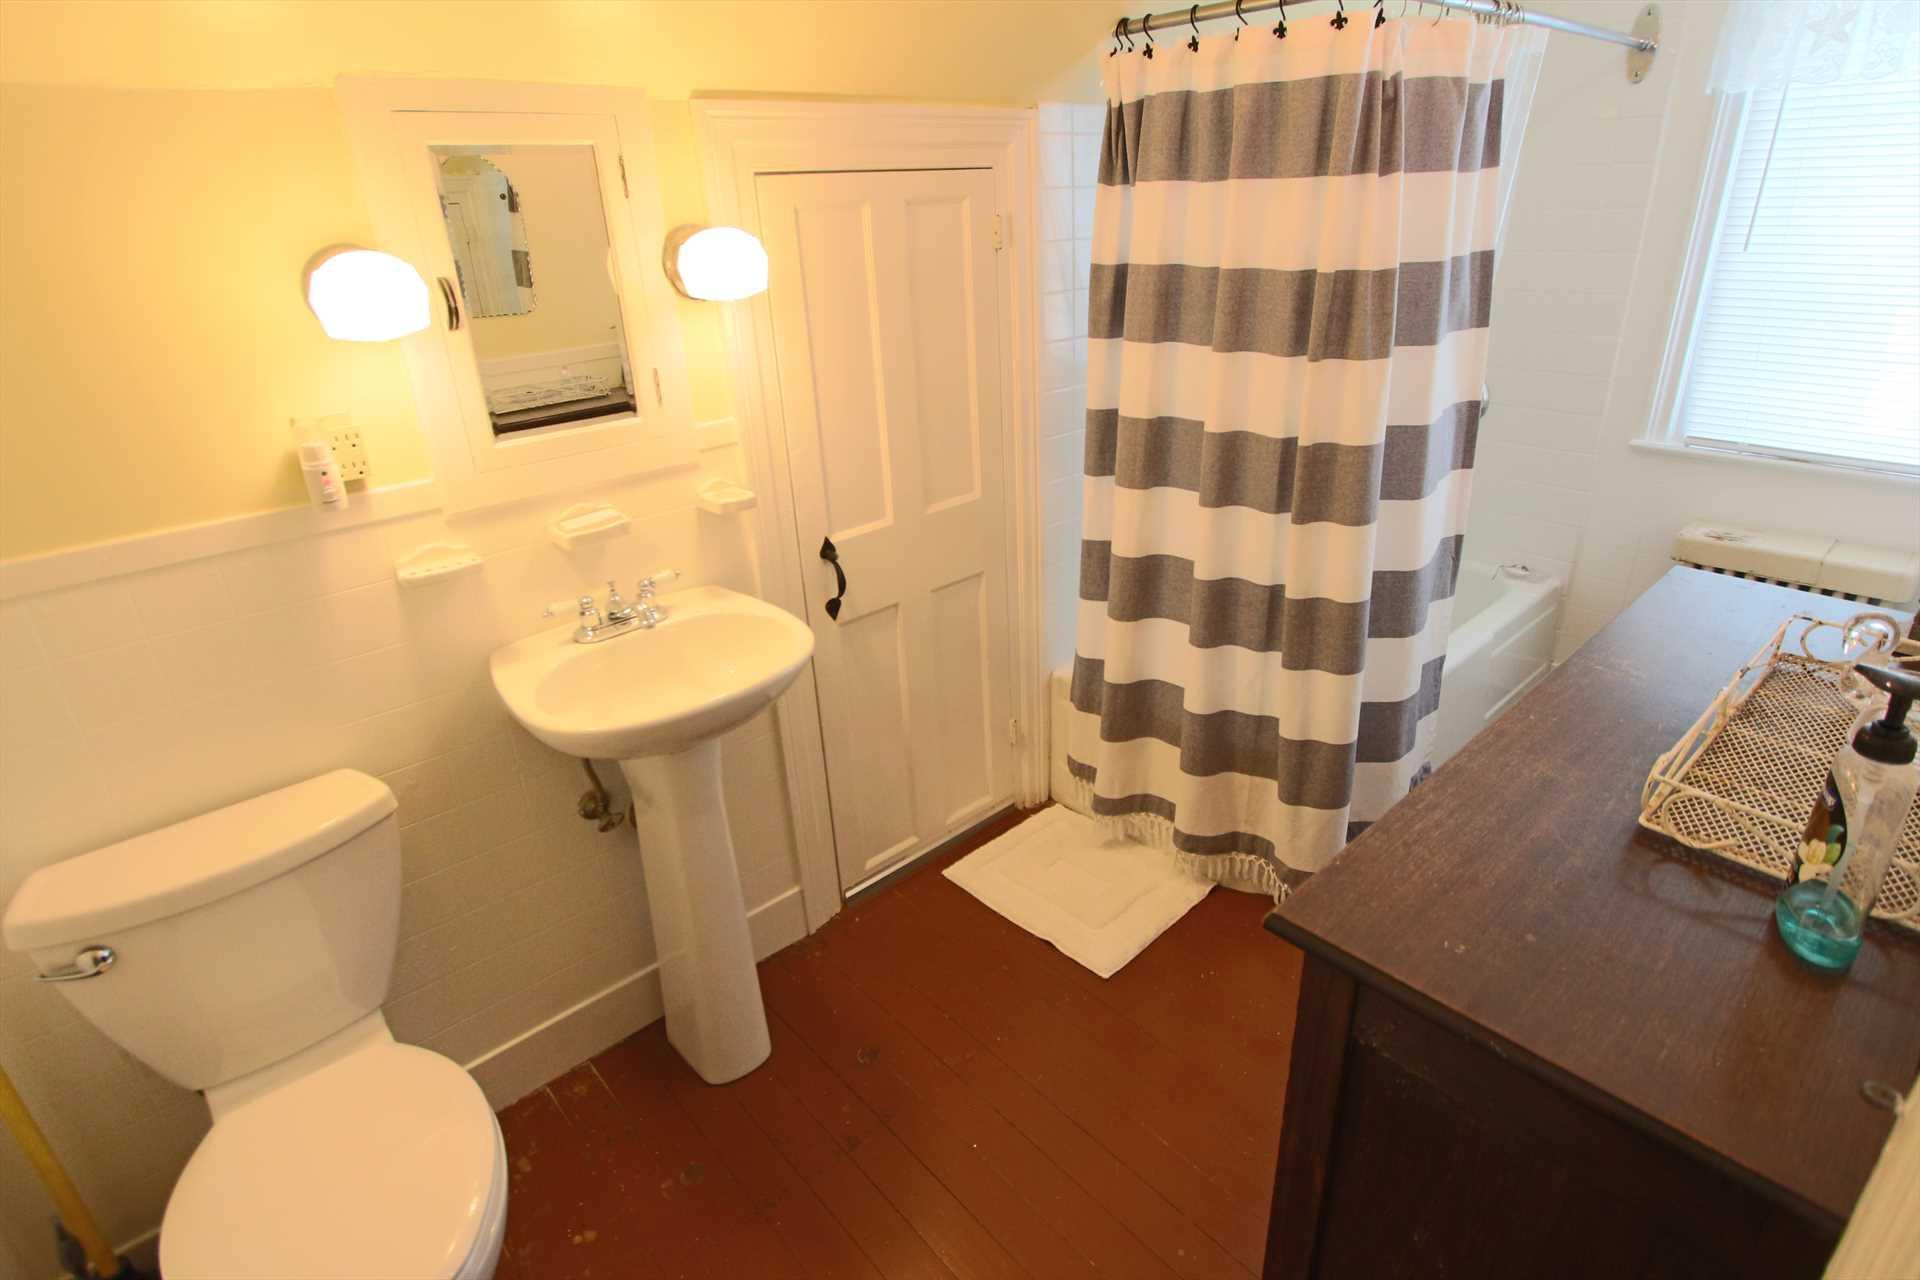 Bathroom - 2nd Floor - Tub & Shower